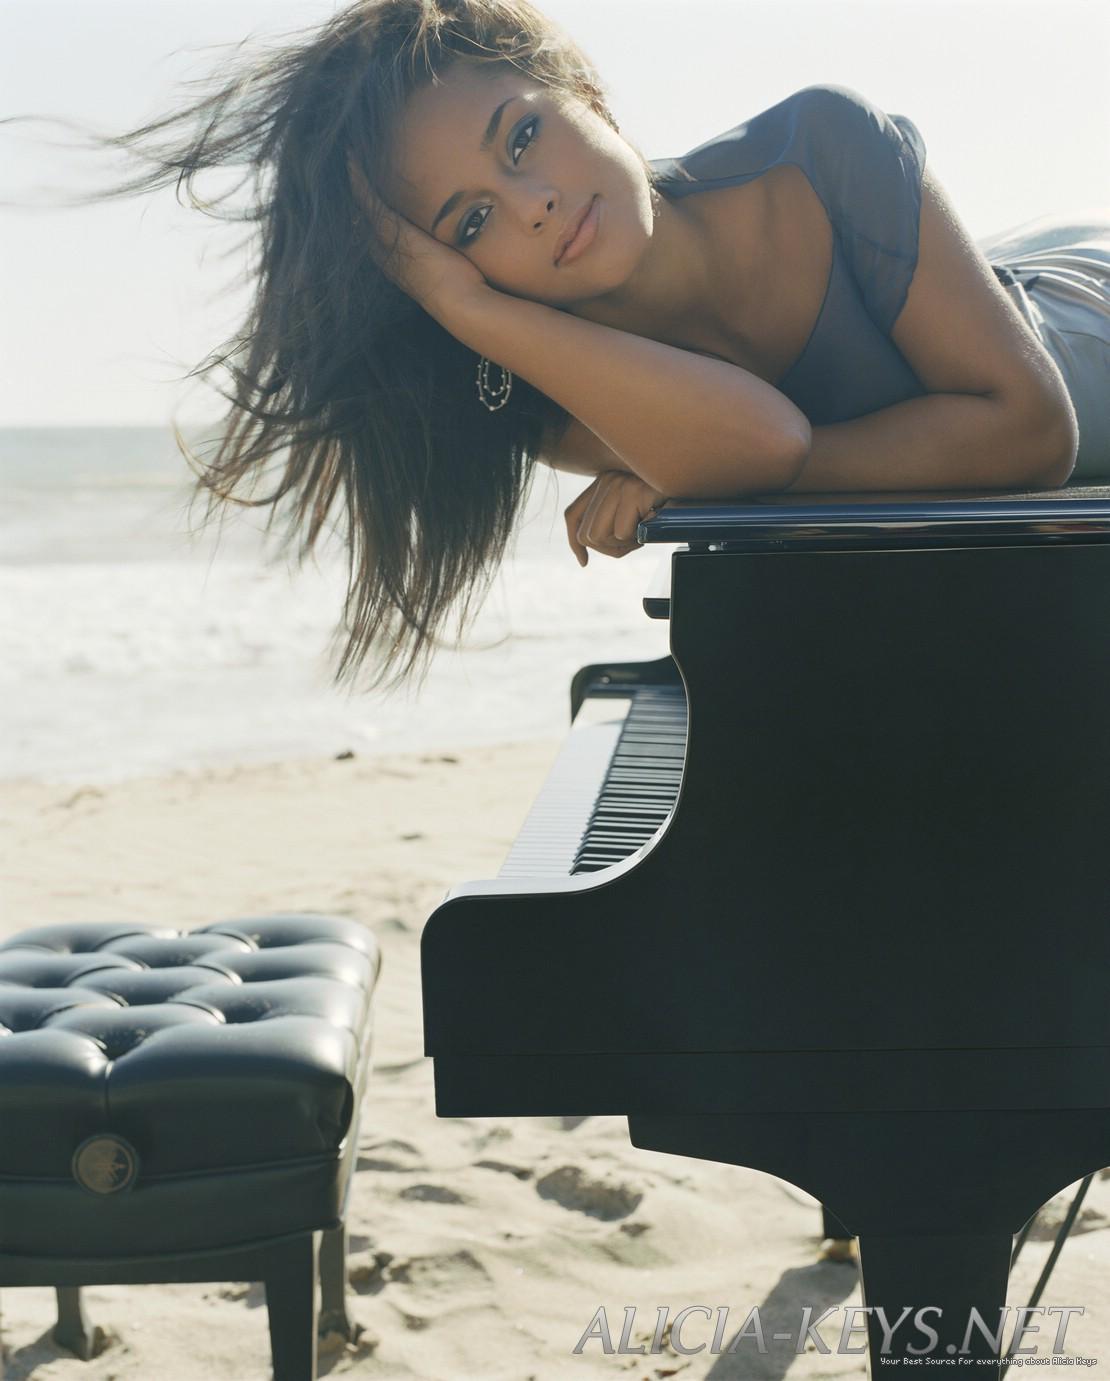 Alicia Keys список песен.